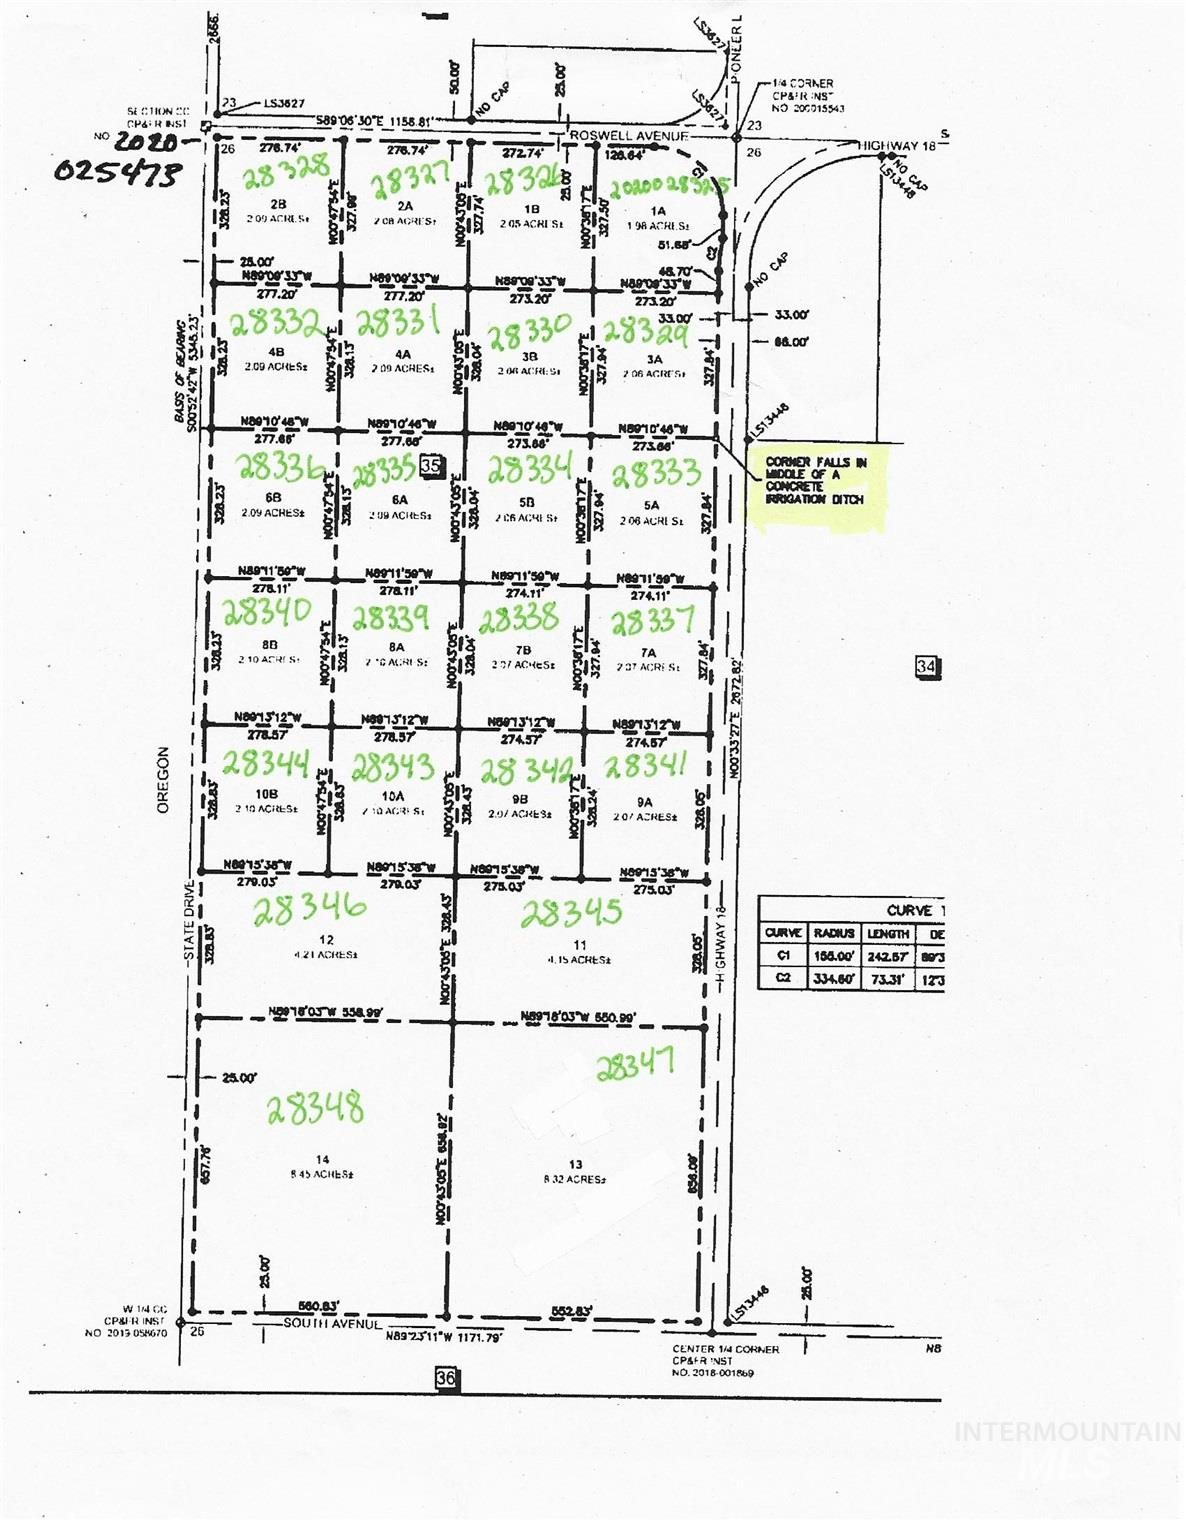 East Parcel Highway 18 Property Photo